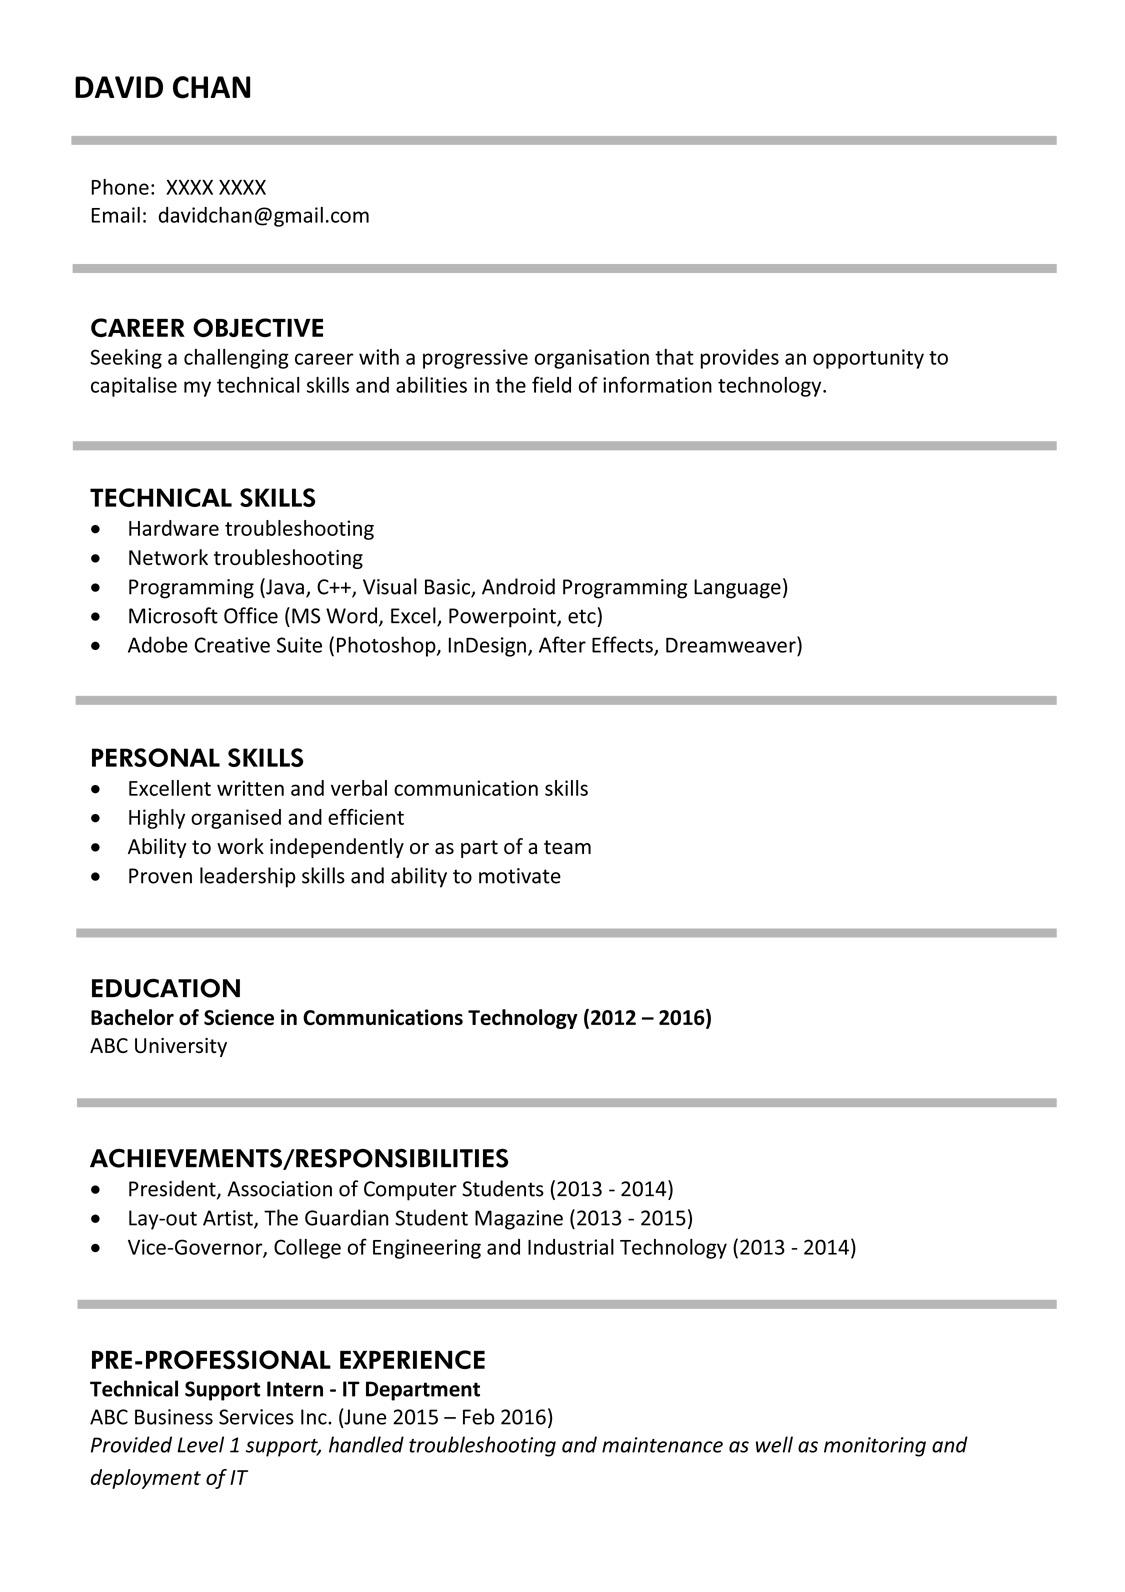 Sample resume for fresh graduates (IT professional) | jobsDB ...